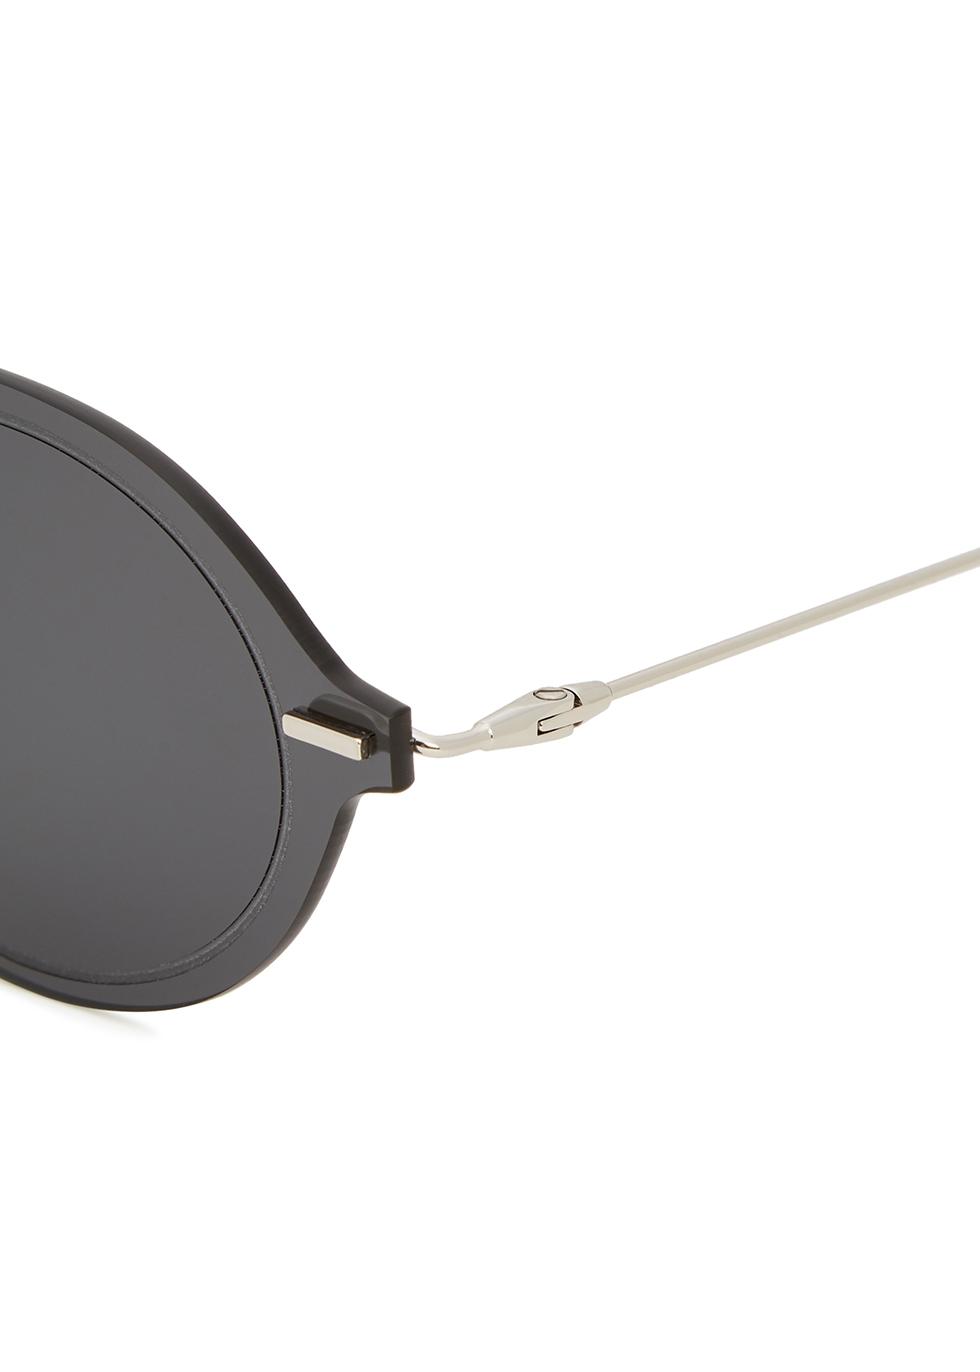 Dior Chroma 3 oval-frame sunglasses - Dior Homme